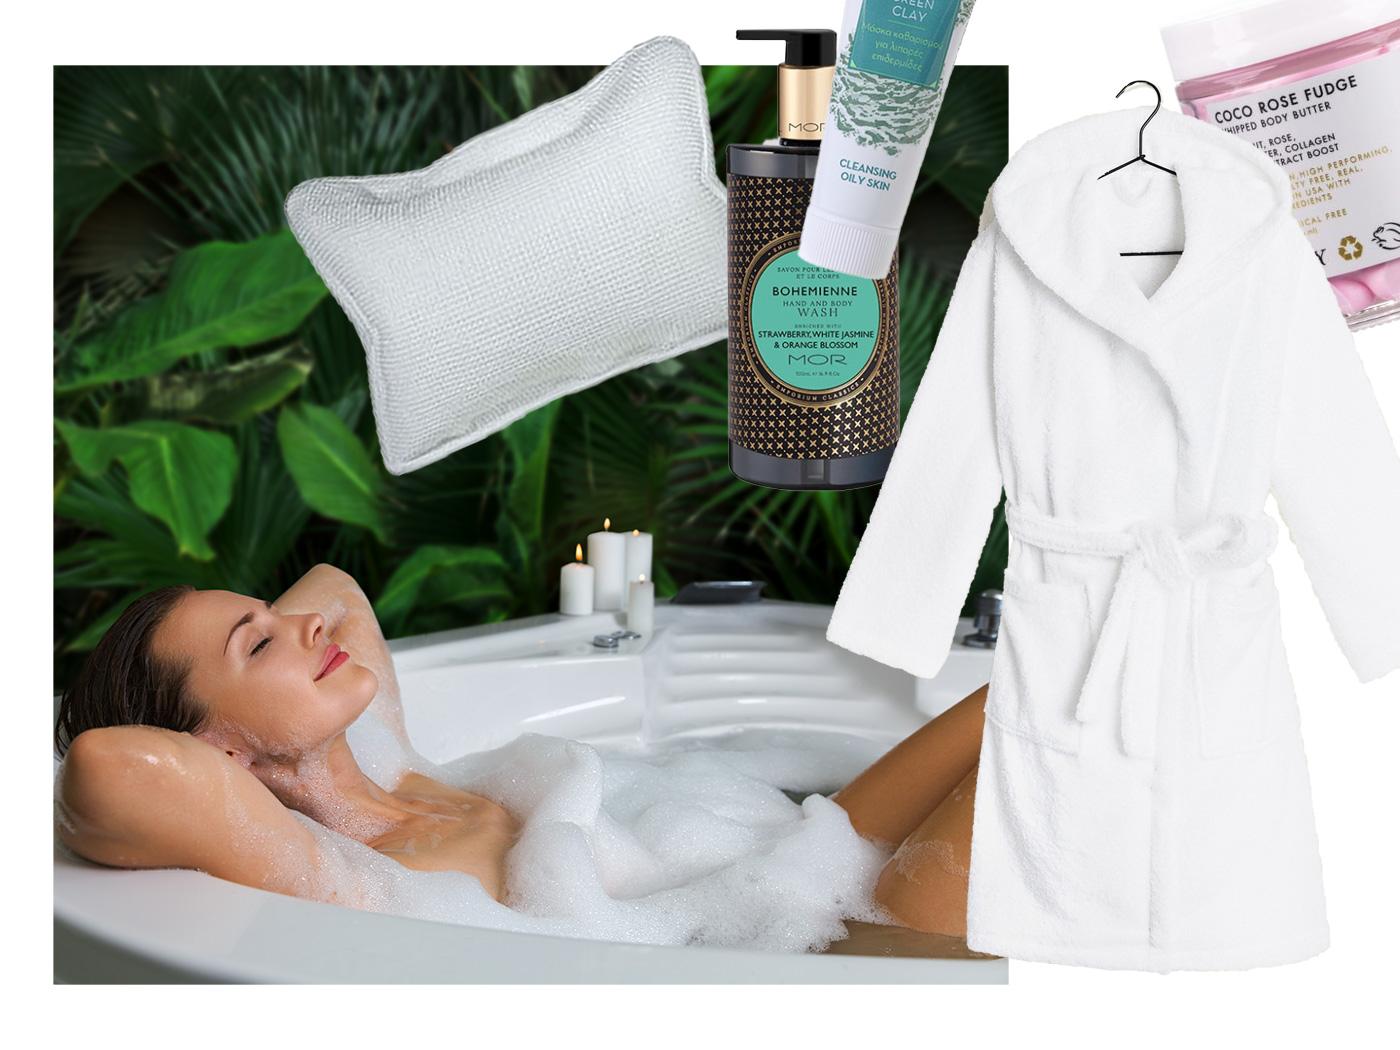 6 tips για να περάσεις στο σπίτι σου όπως θα περνούσες σε ένα spa!